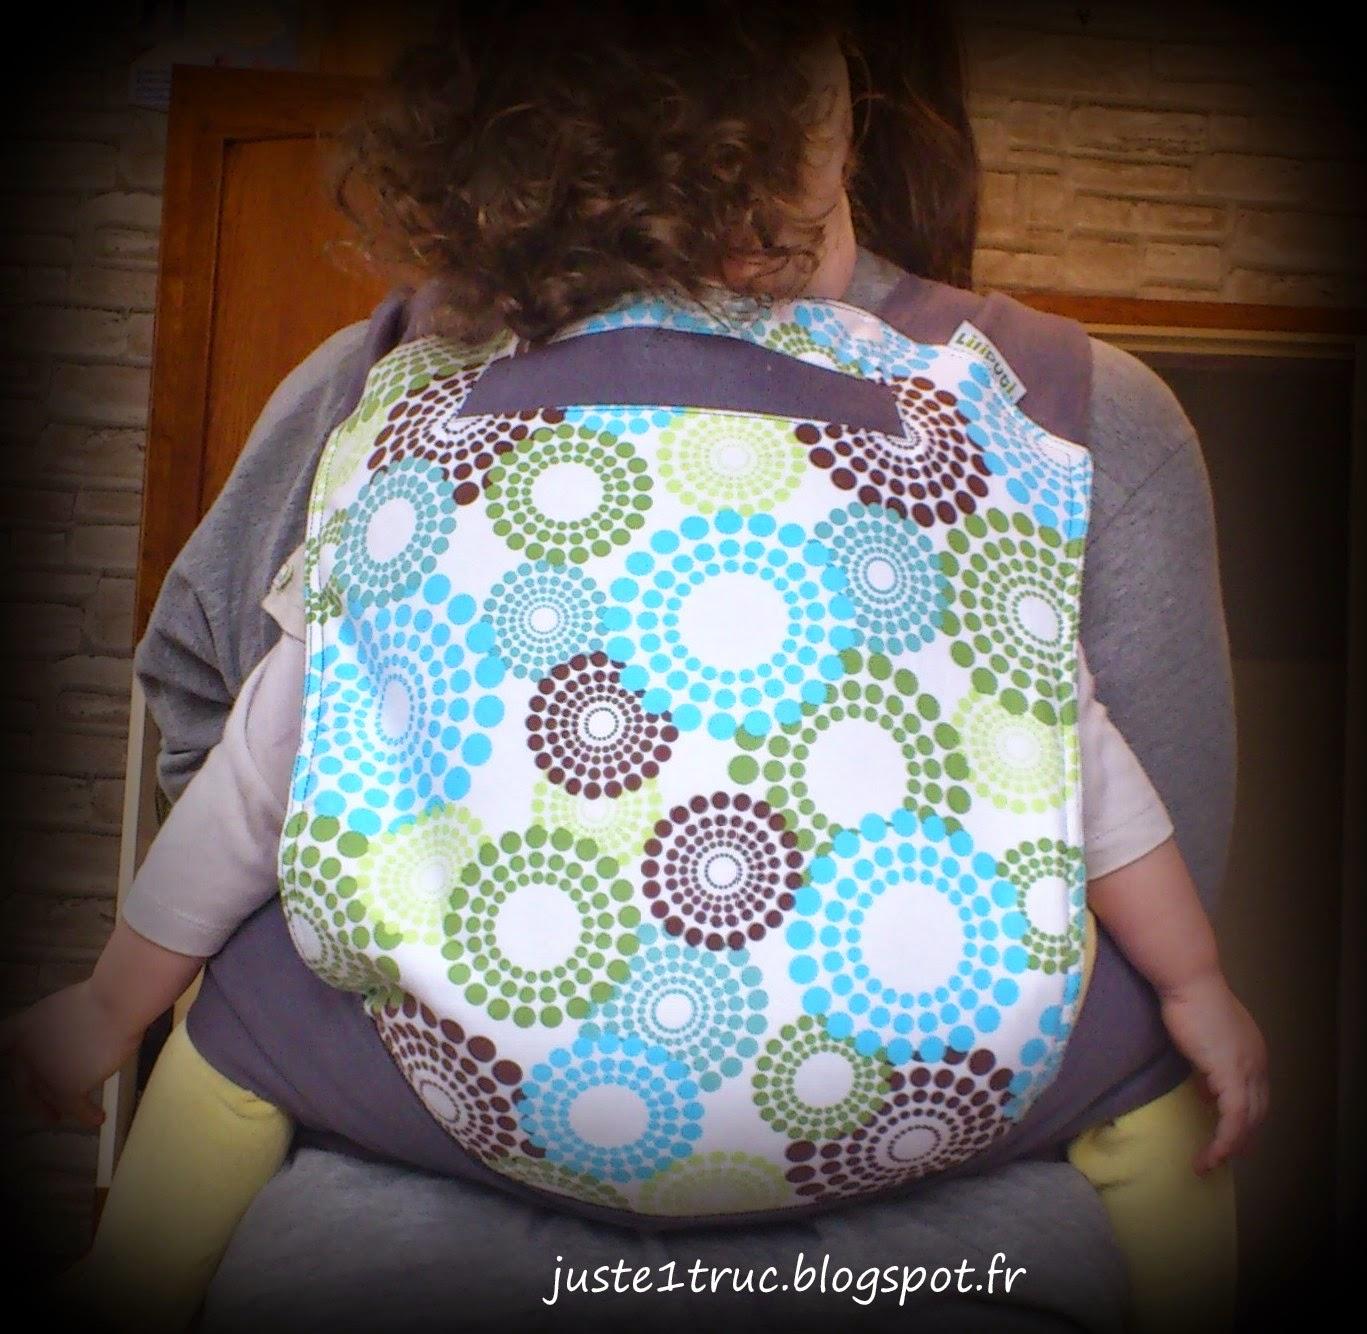 meitai mei-tai Liliputi babywearing portage froid chaud porter bambin bébé